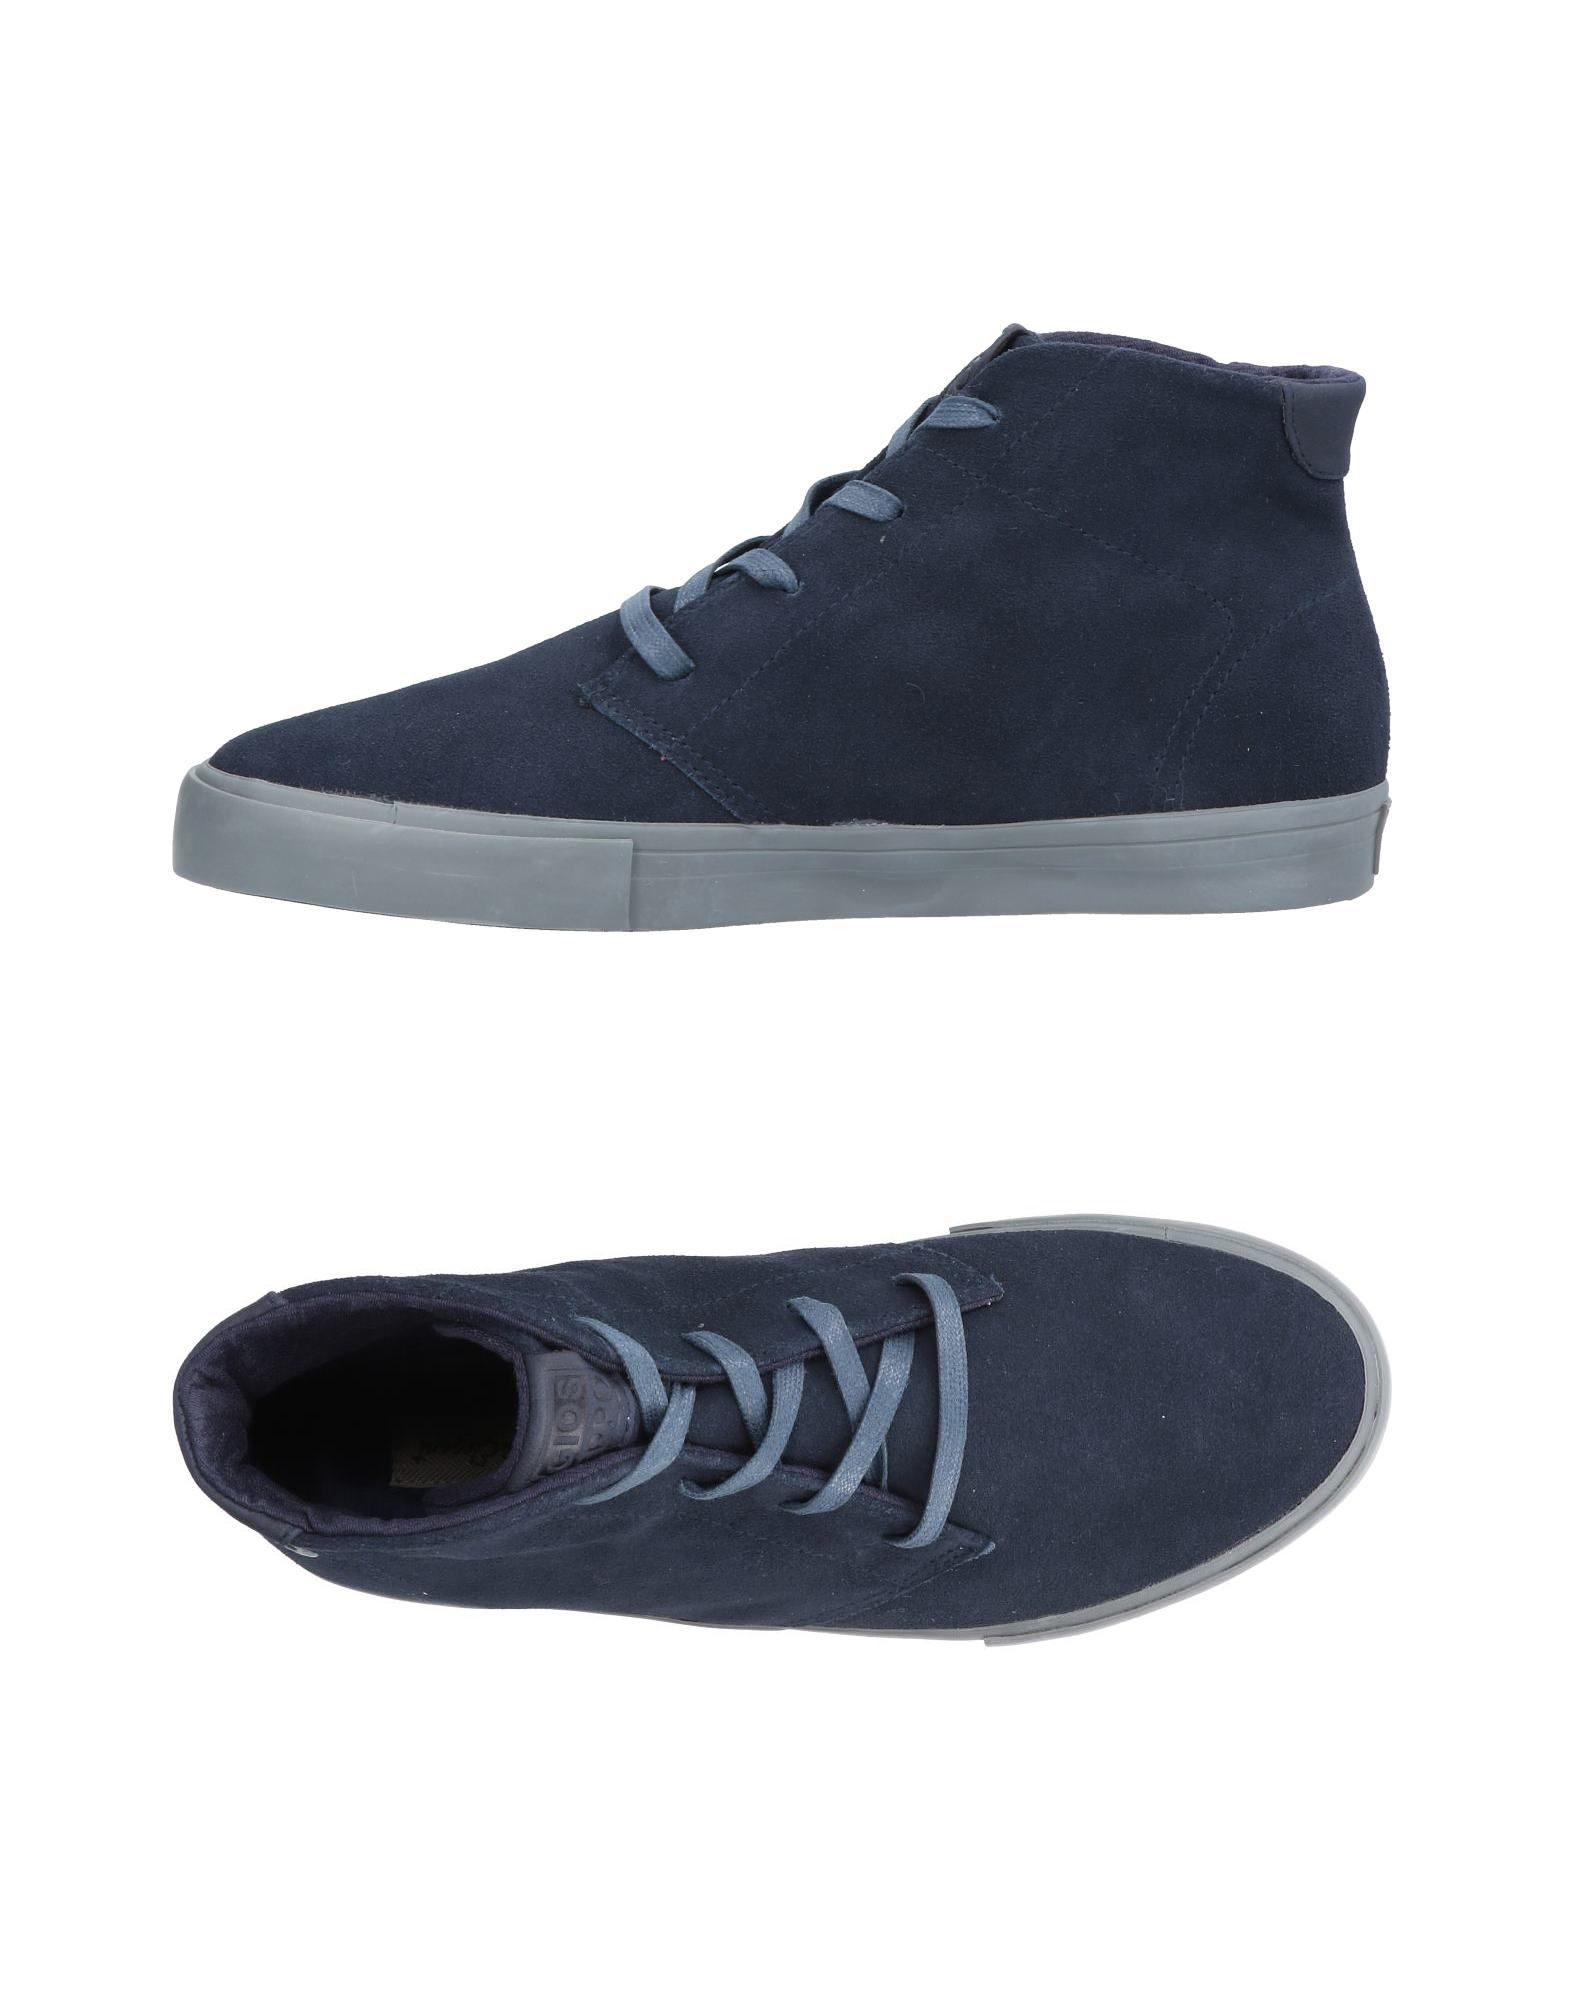 Sneakers Gioseppo Homme - Sneakers Gioseppo  Noir Super rabais